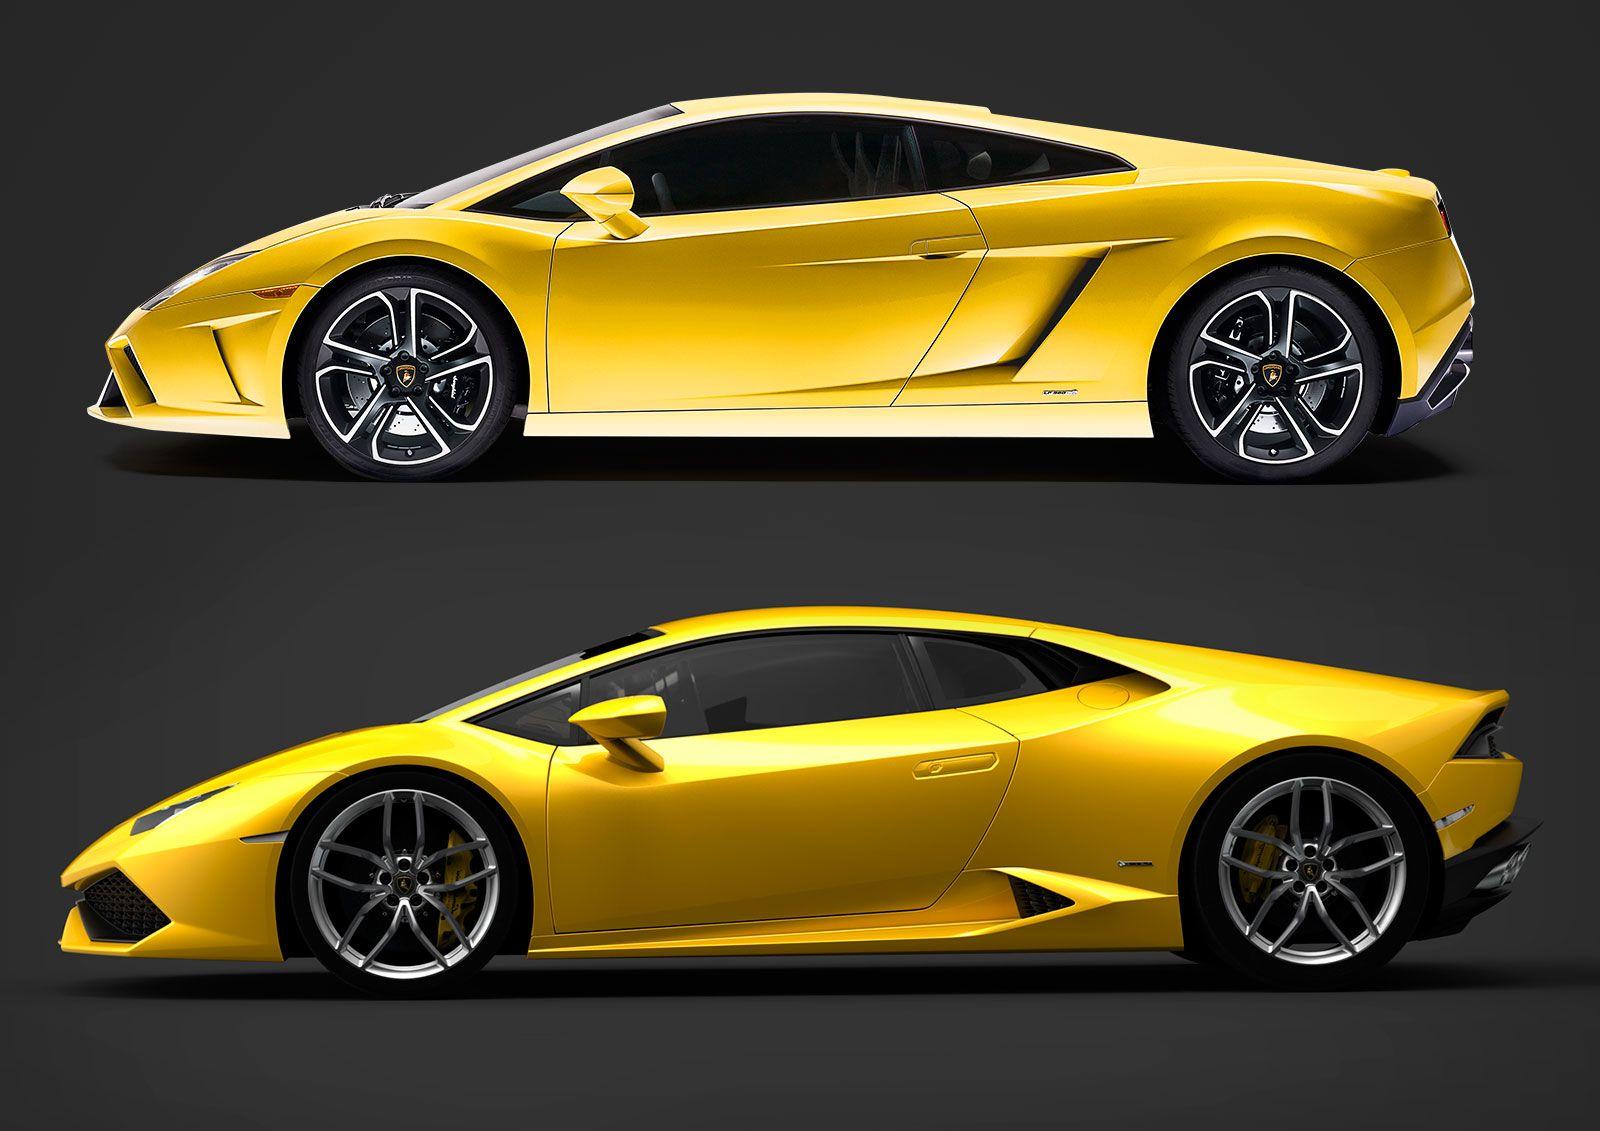 Lamborghini Gallardo Vs Huracan Automotive Lamborghini Gallardo